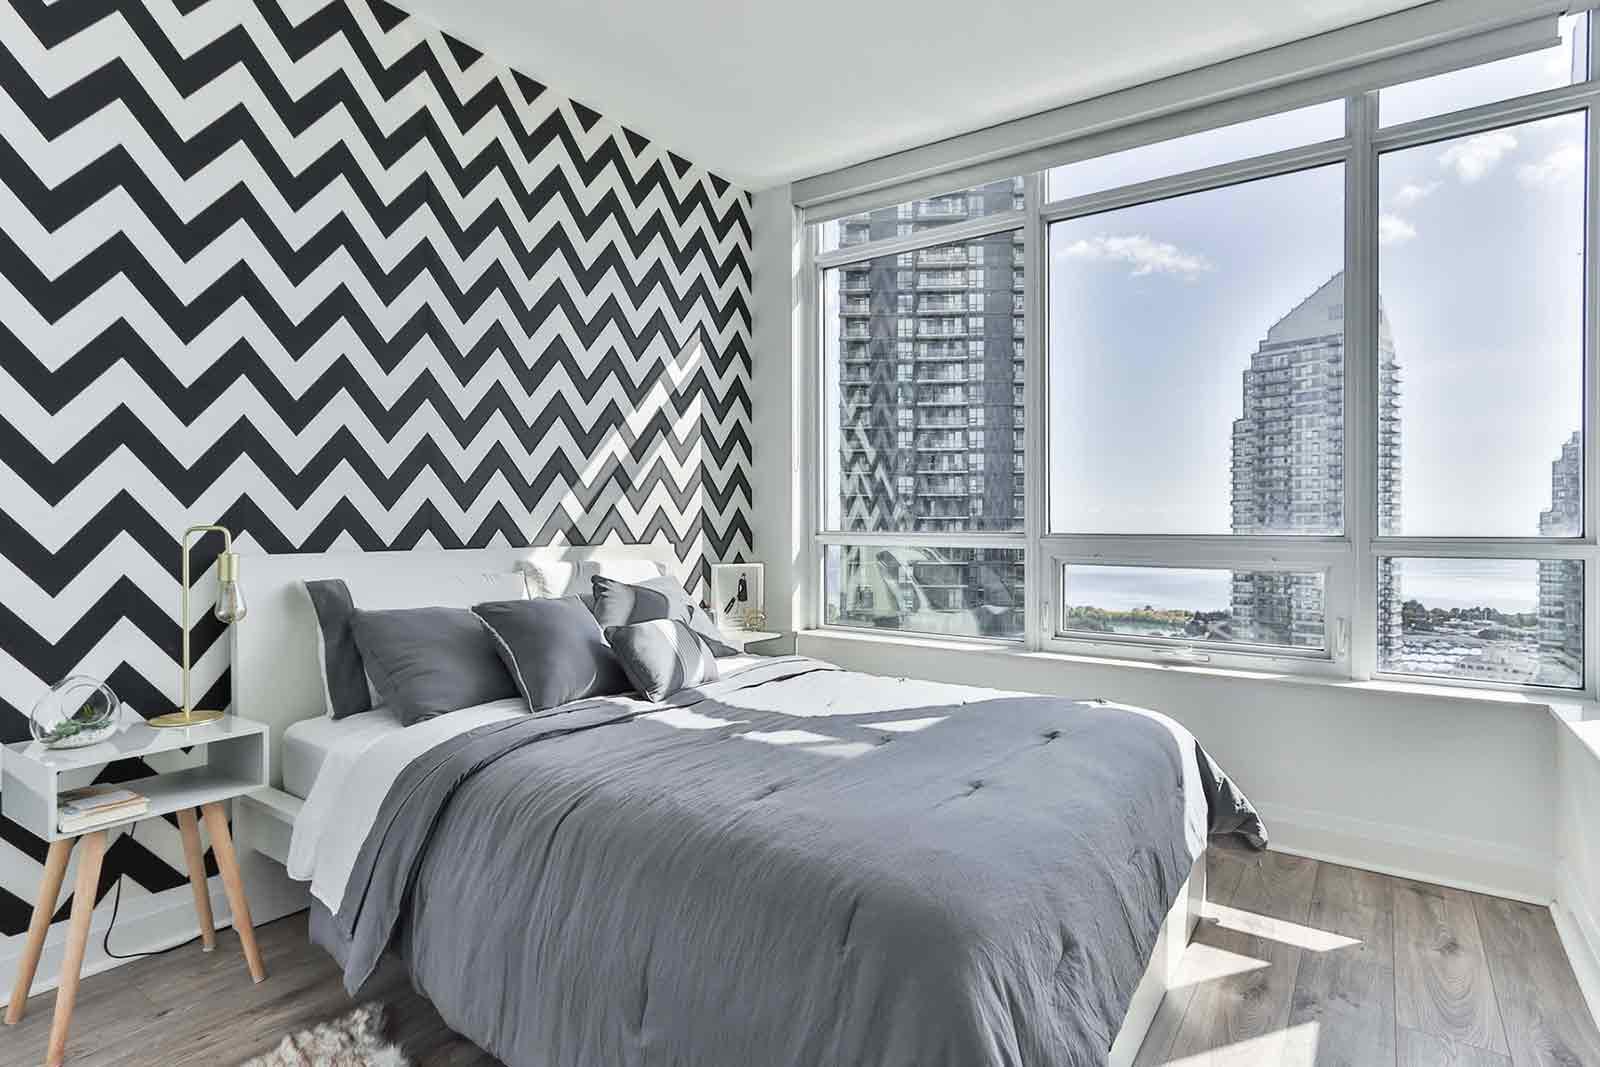 Dekorasi kamar tidur dengan wallpaper, foto oleh Sidekix Media, via unsplash.com